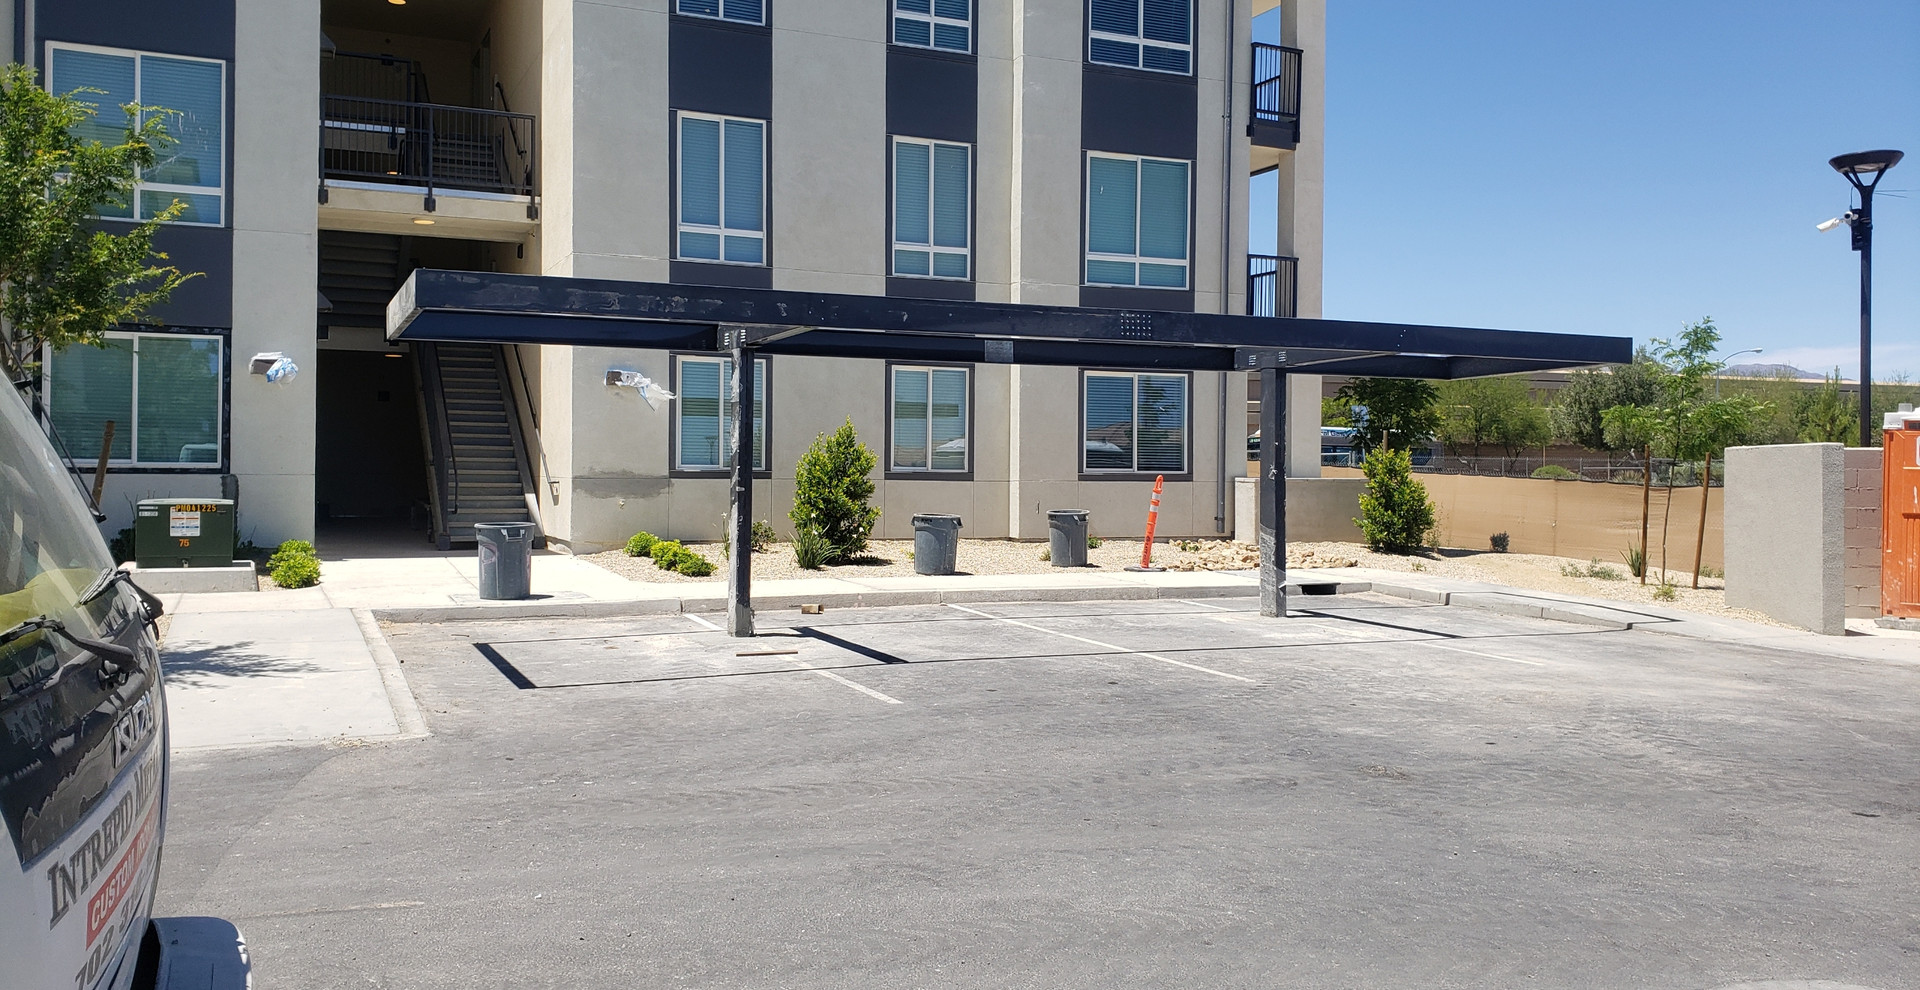 Commercial Carports For Apartments Las Vegas - Intrepid Metal Works Inc.